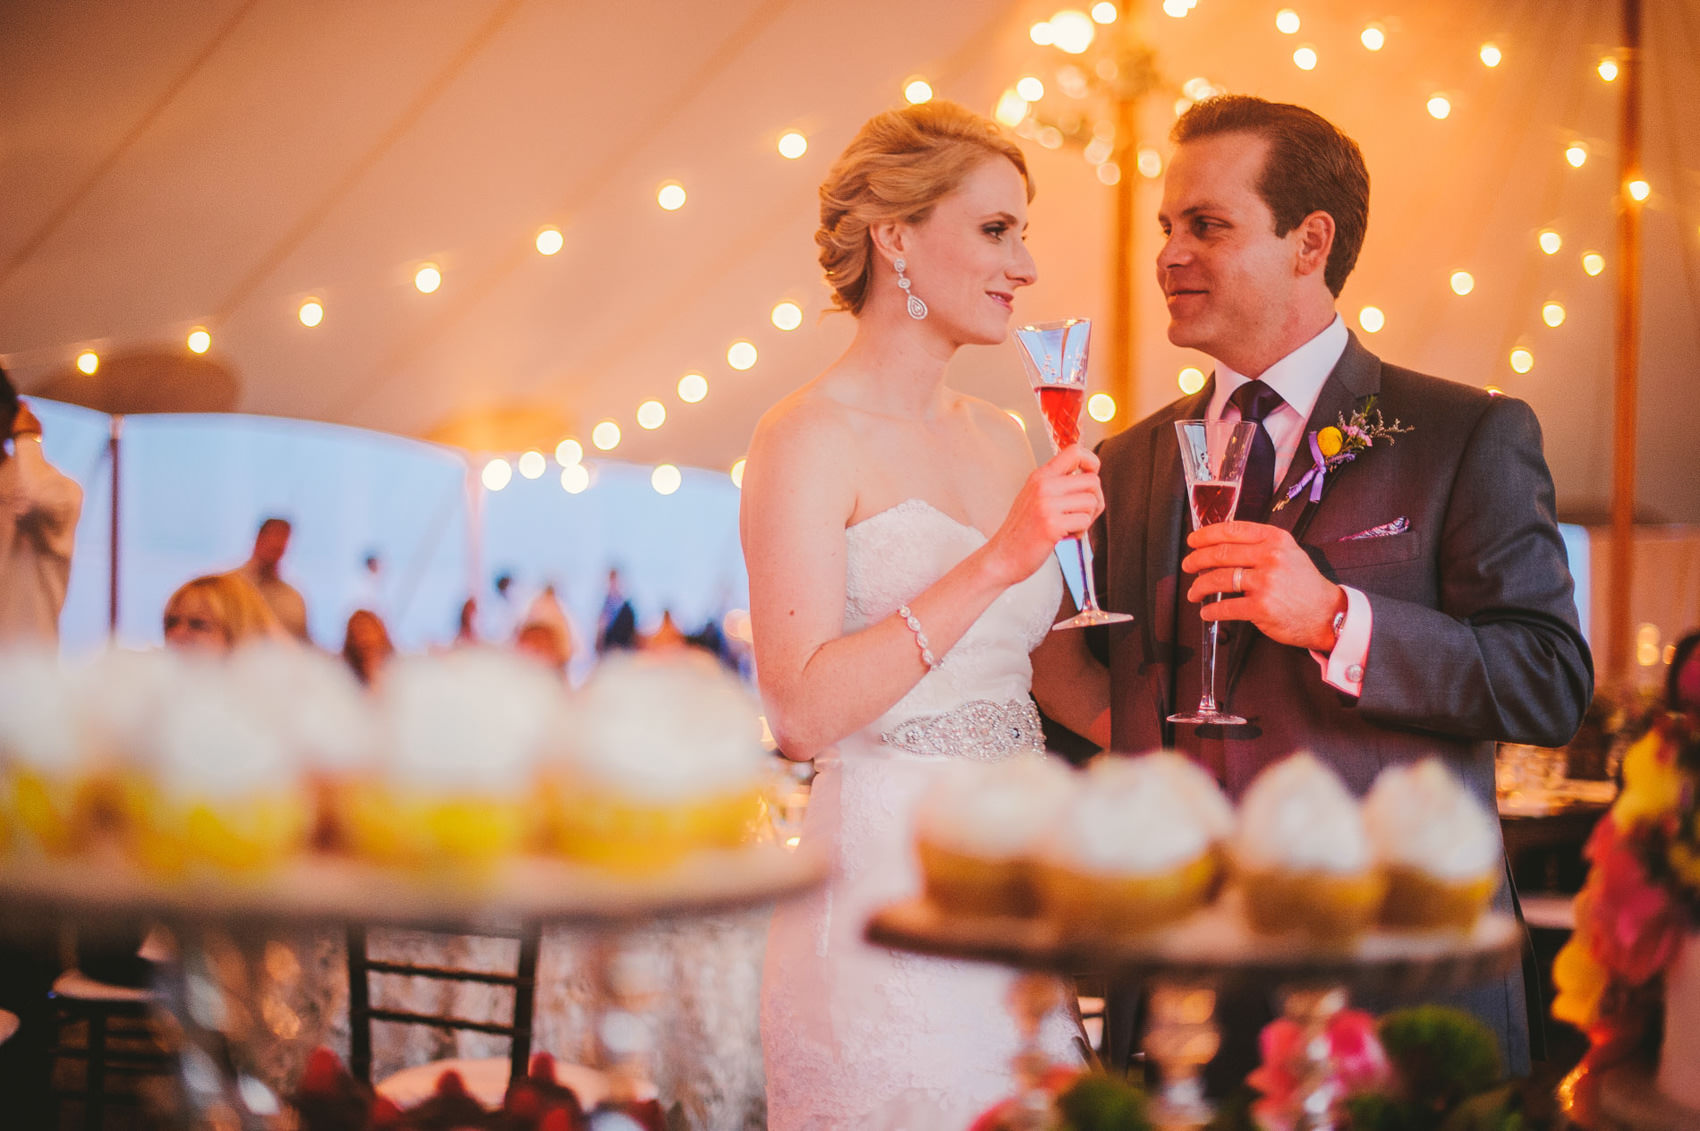 029-oberports-wedding-reception-portfolio